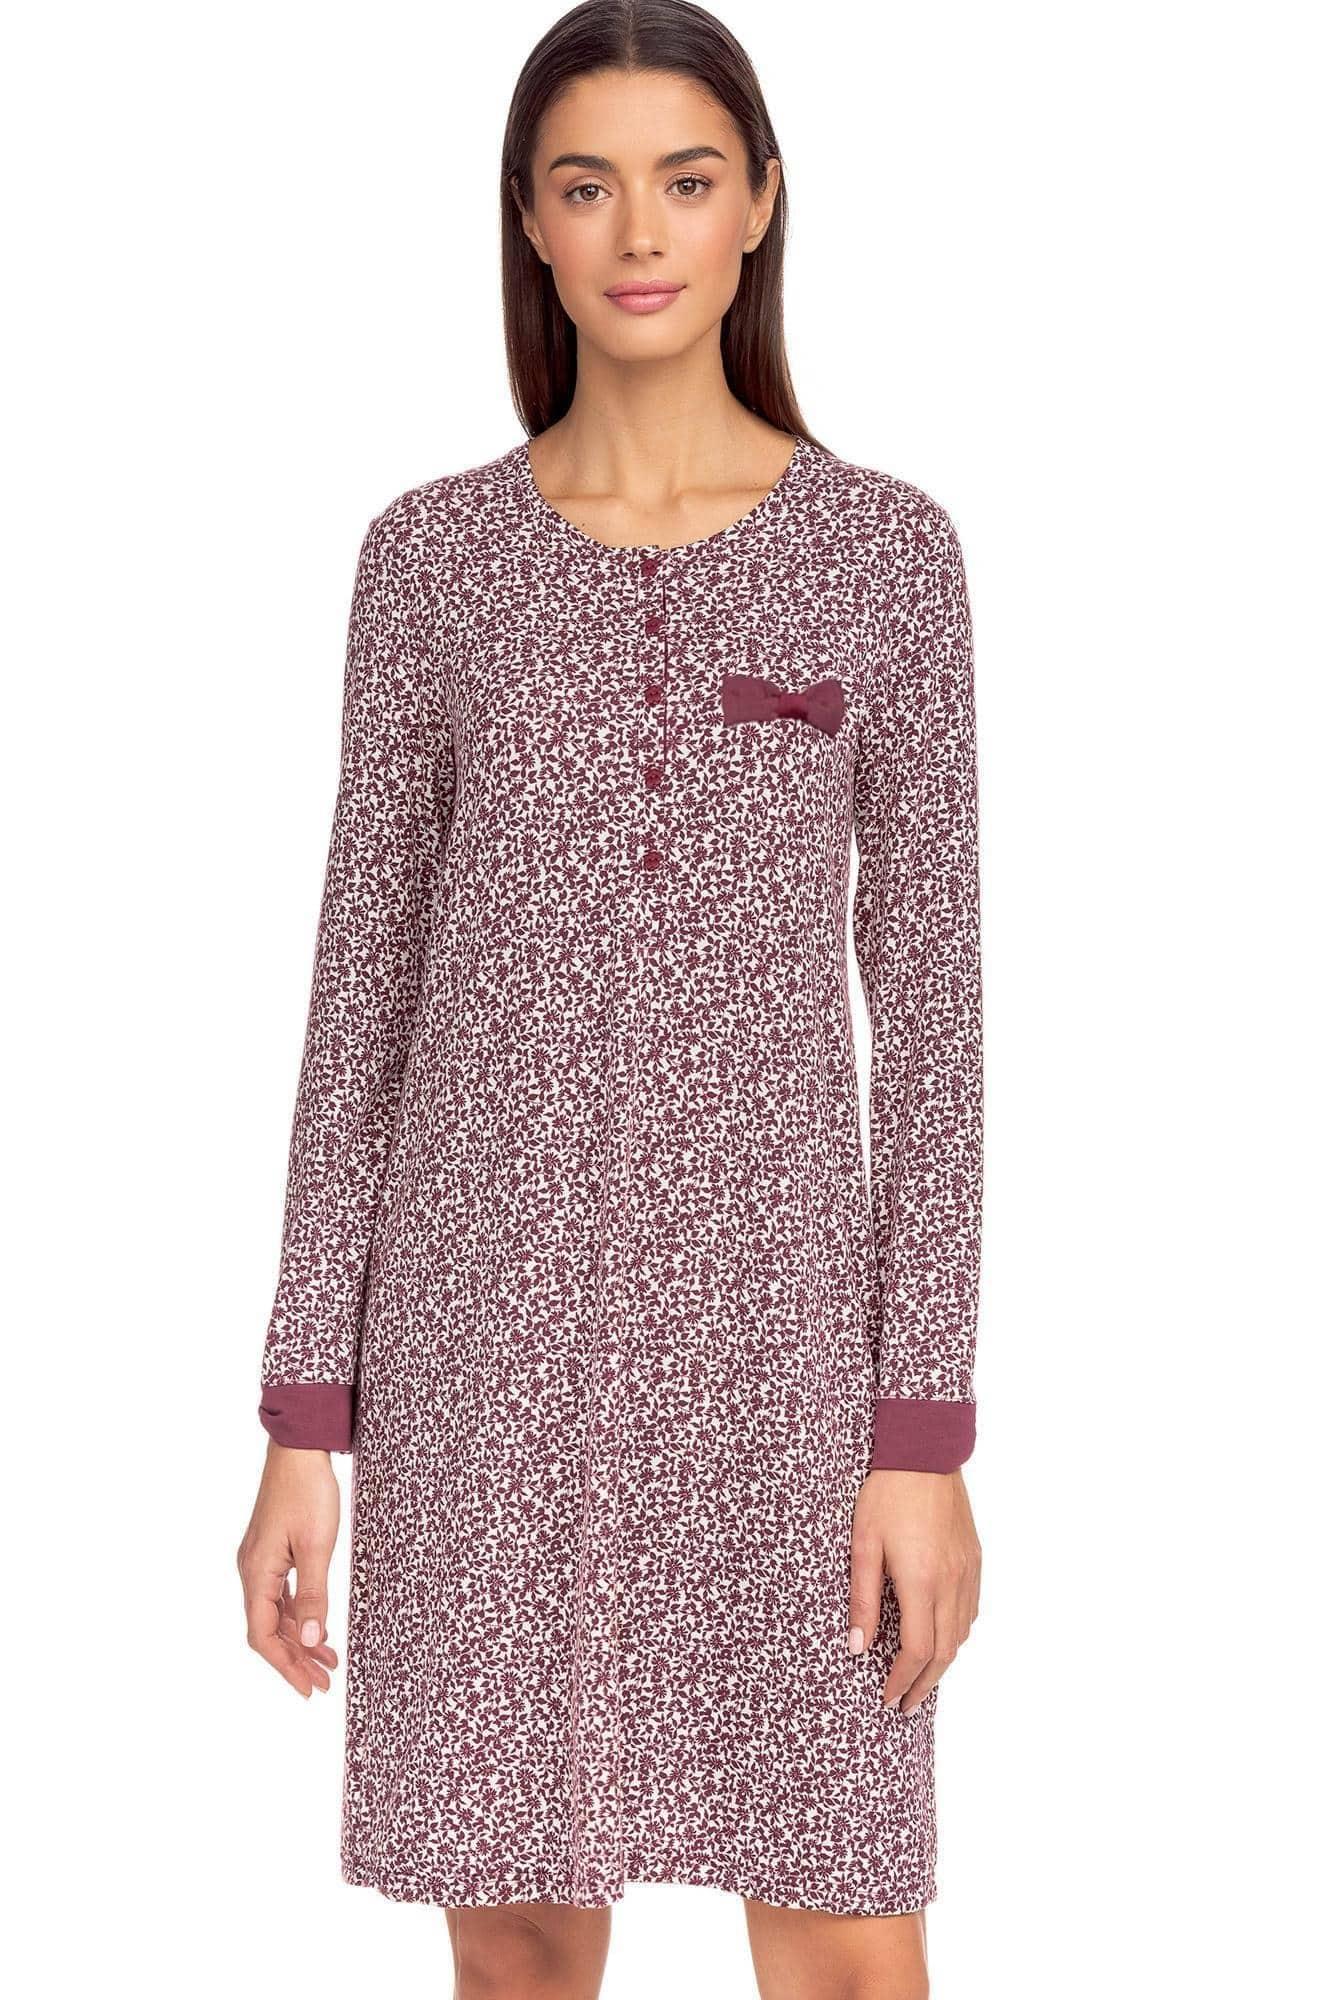 Women's classic nightgown